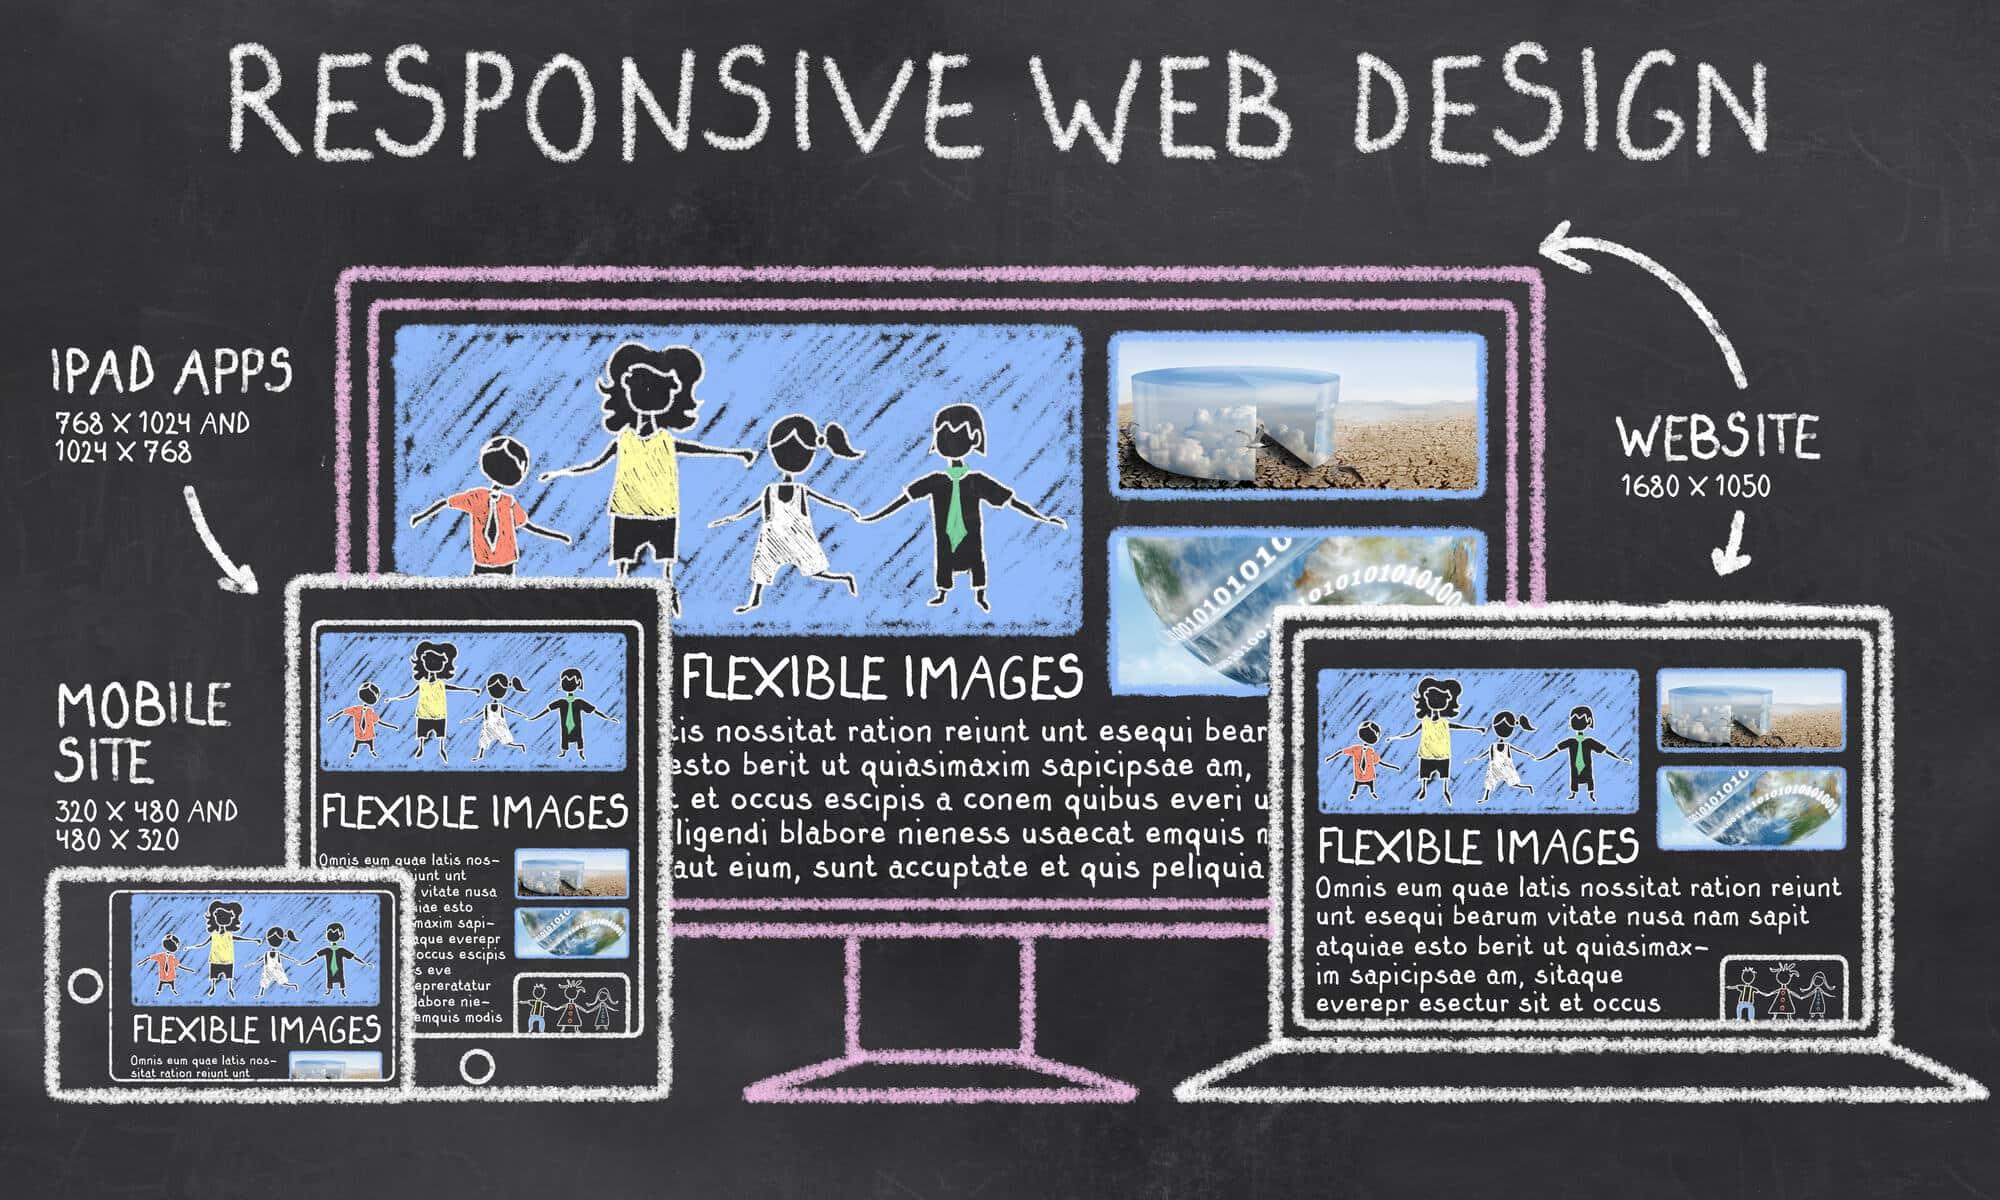 Web Design Agency in Texas - Big Easy SEO